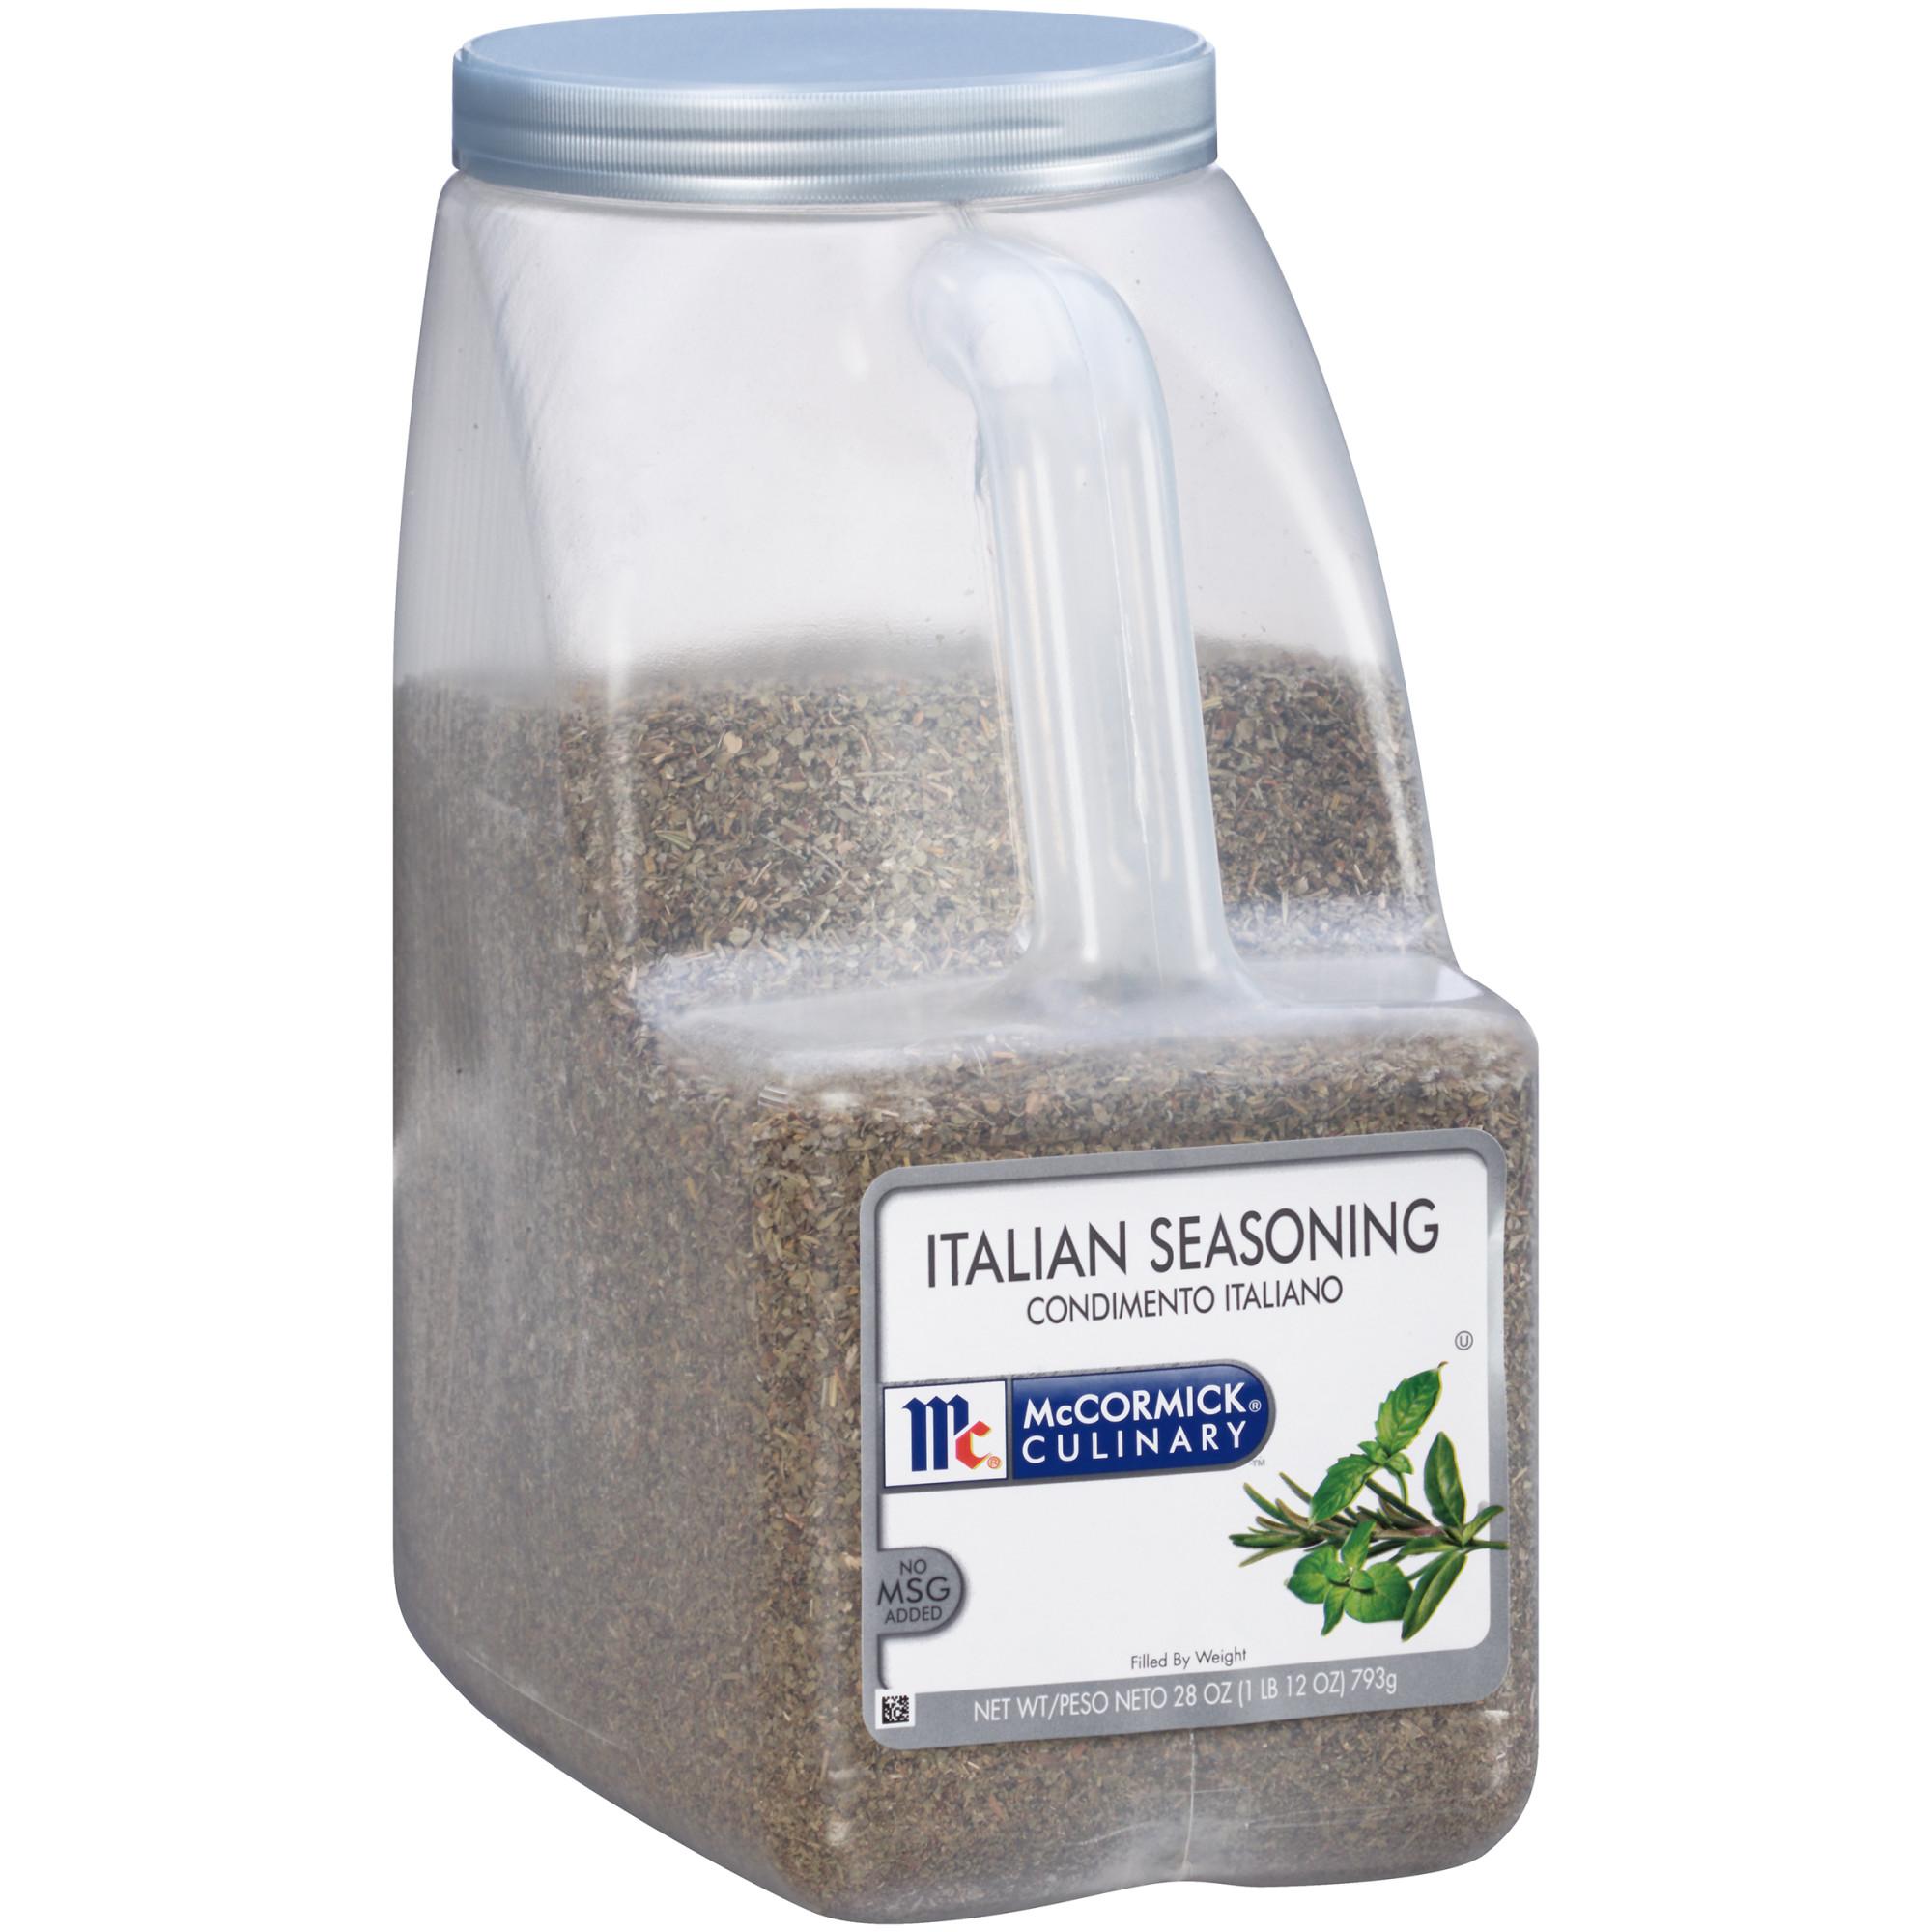 McCormick Culinary Italian Seasoning, 1.75 lbs